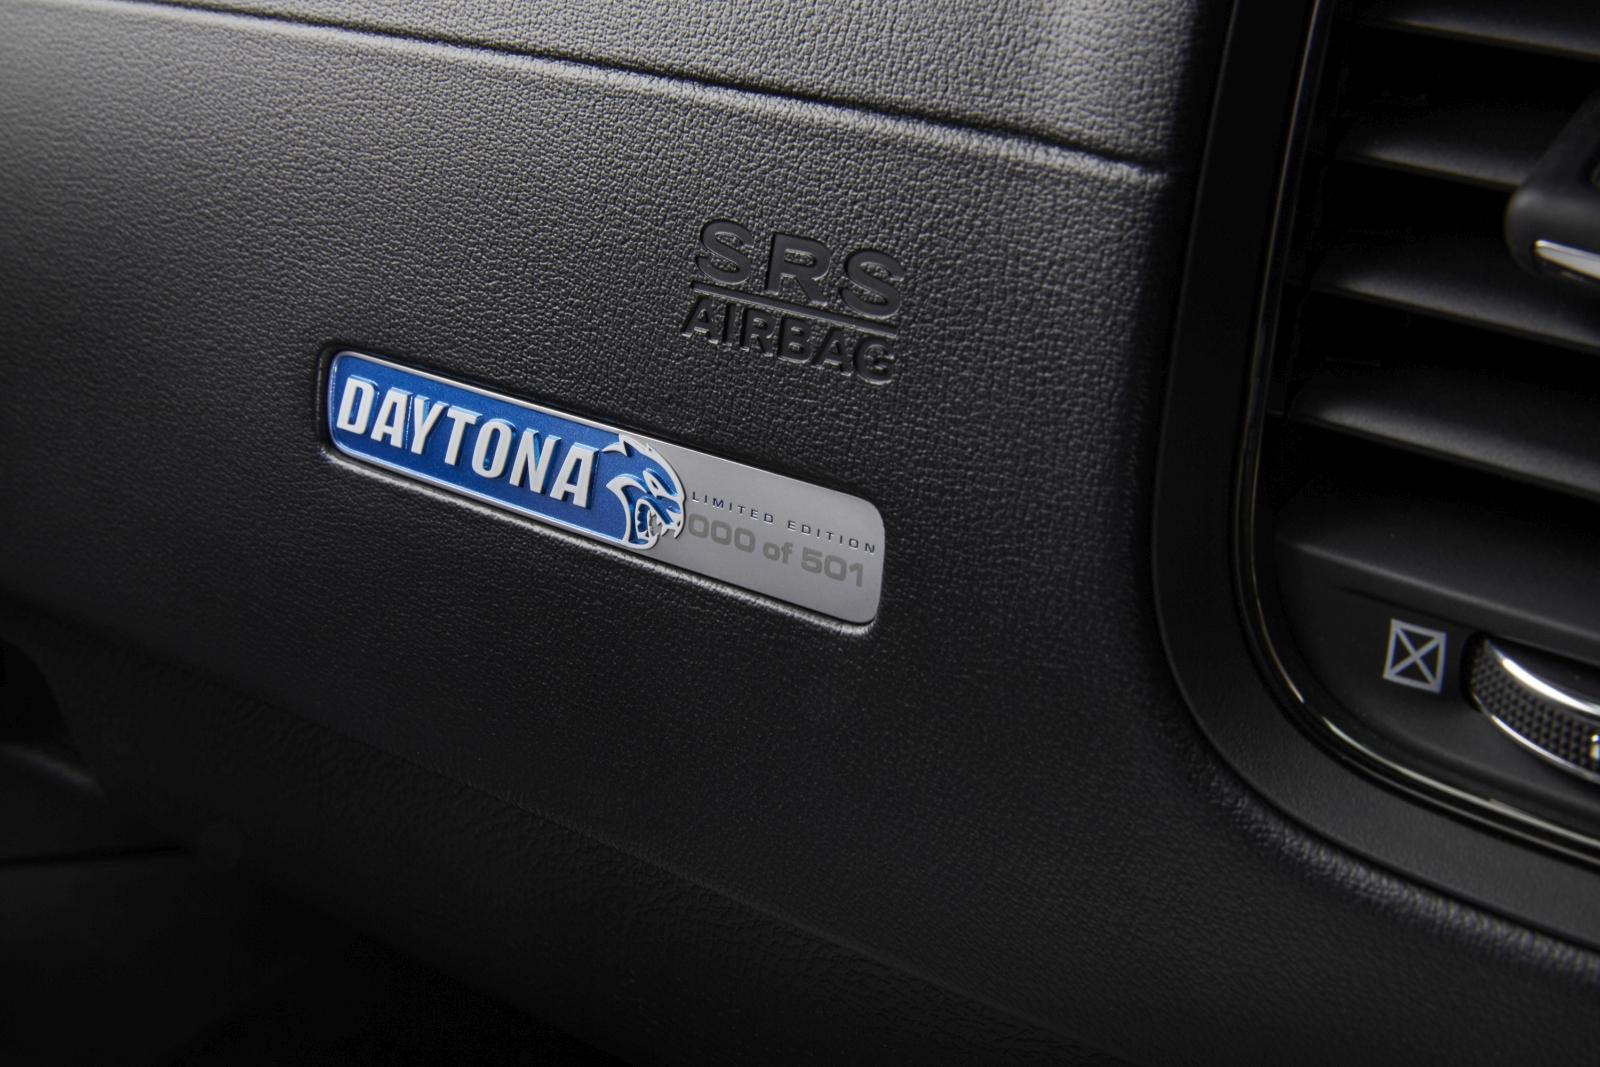 Dodge Charger SRT Hellcat Widebody Daytona 50th Anniversary Edition